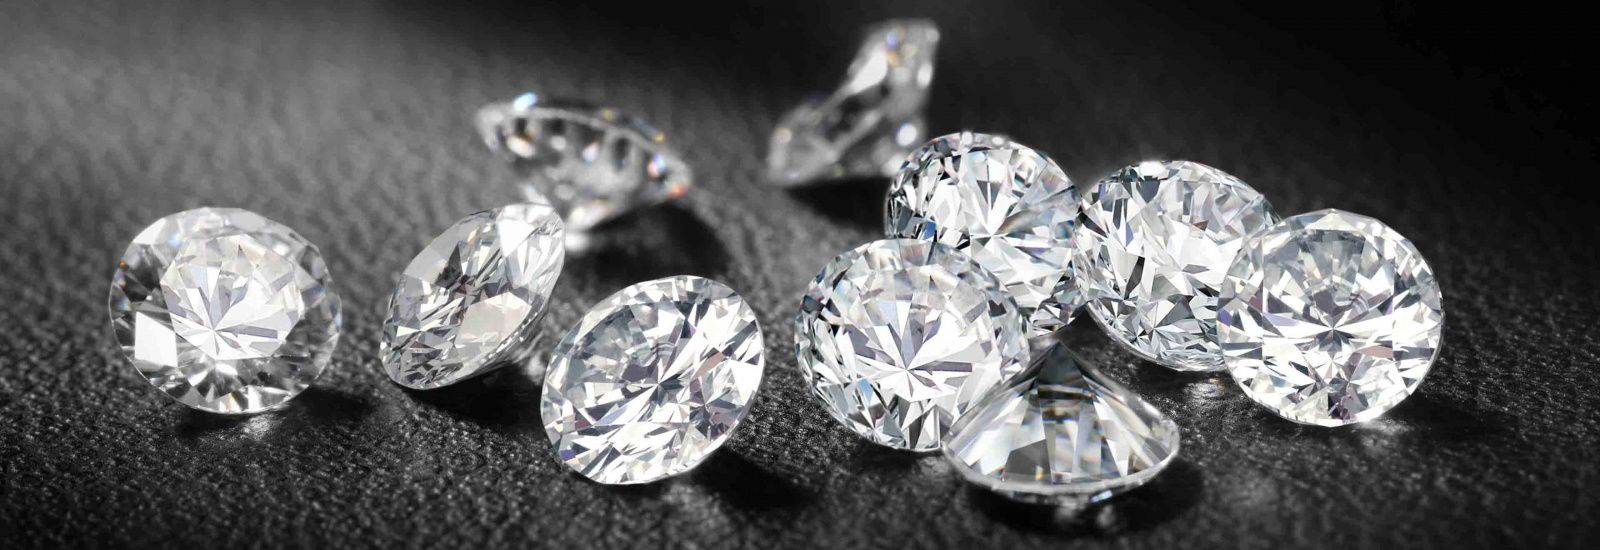 Certified Diamonds Perth